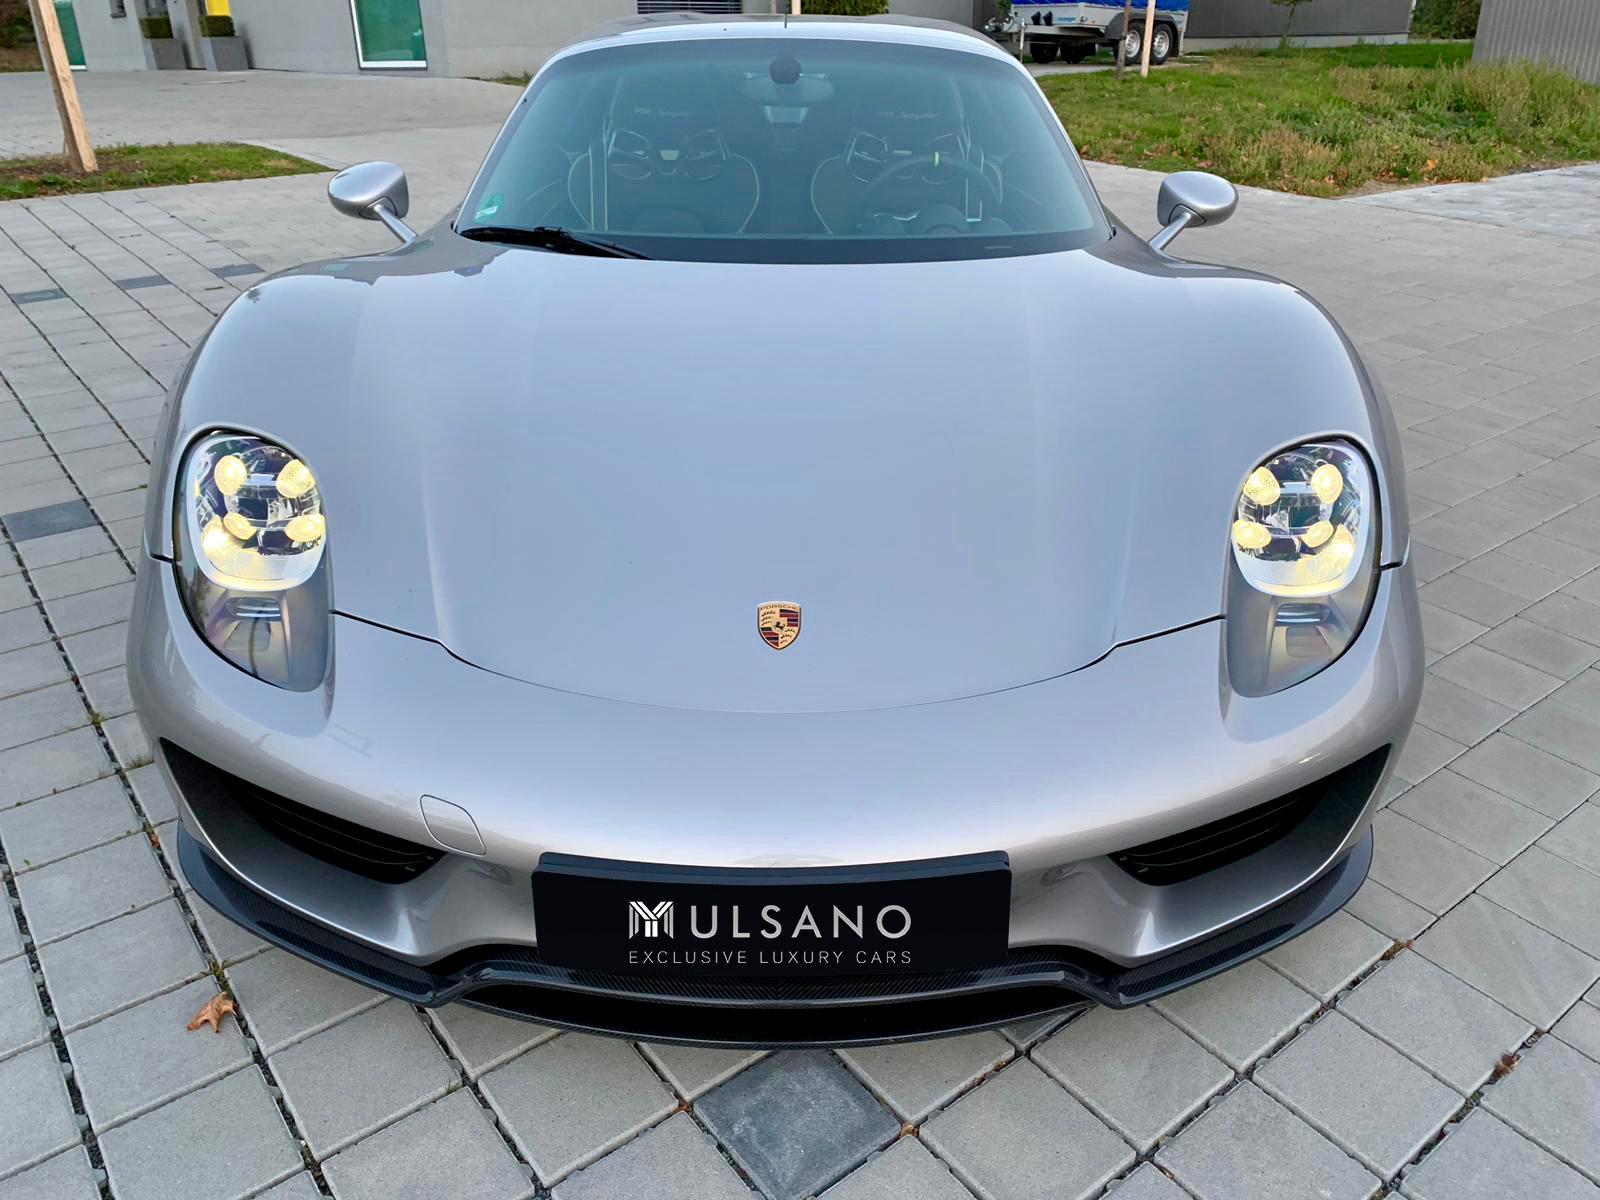 MULSANO // EXCLUSIVE LUXURY CARS